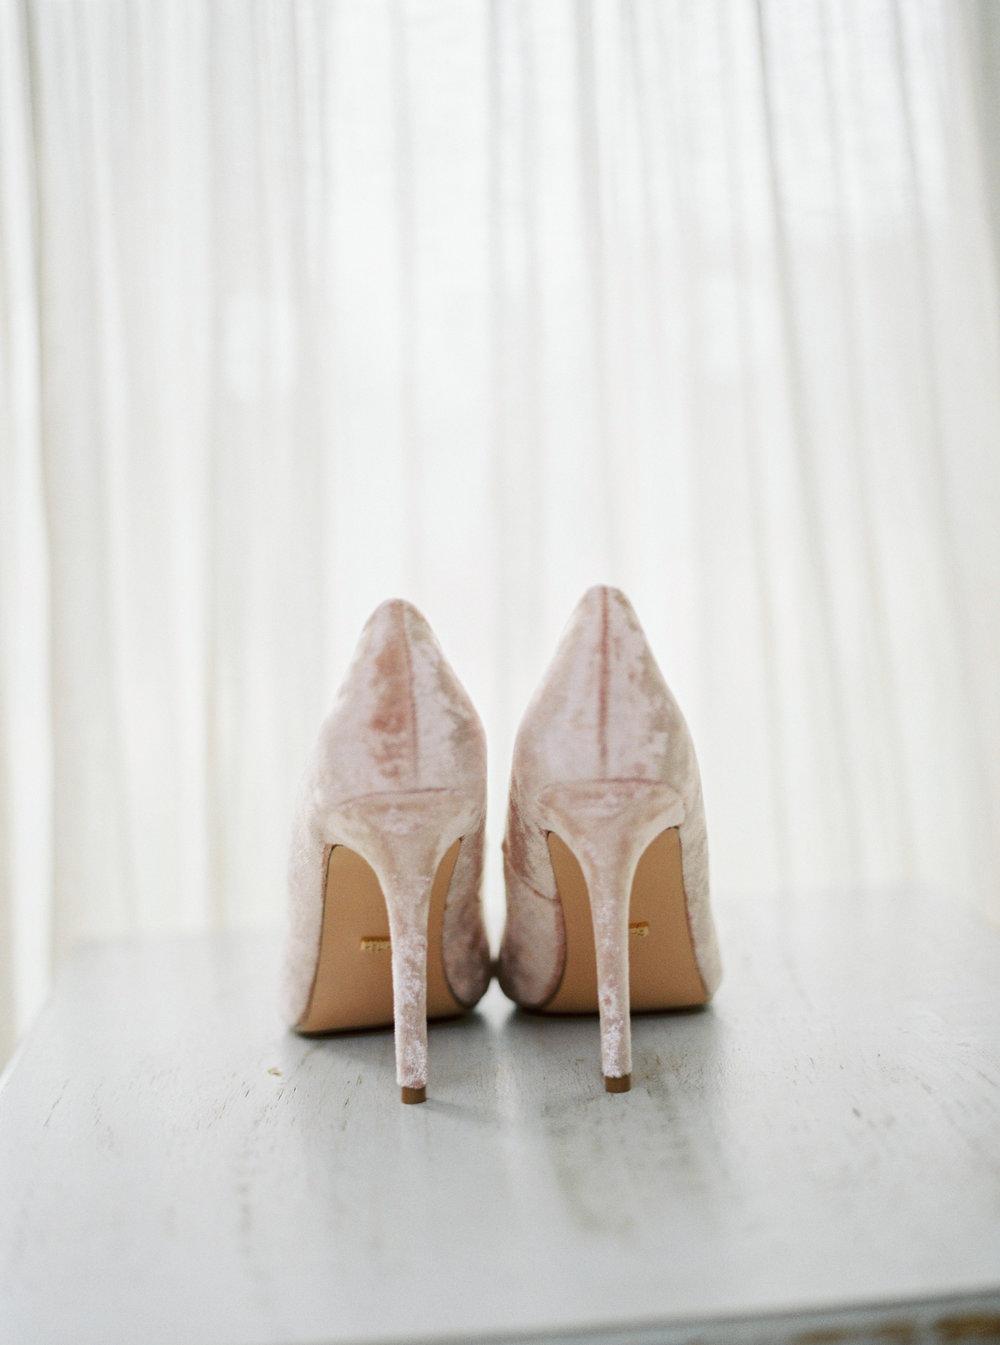 Luxury Wedding Planner UK | Our Chic & Romantic Engagement Shoot in Bath | Katie Julia Photography - 103.JPG